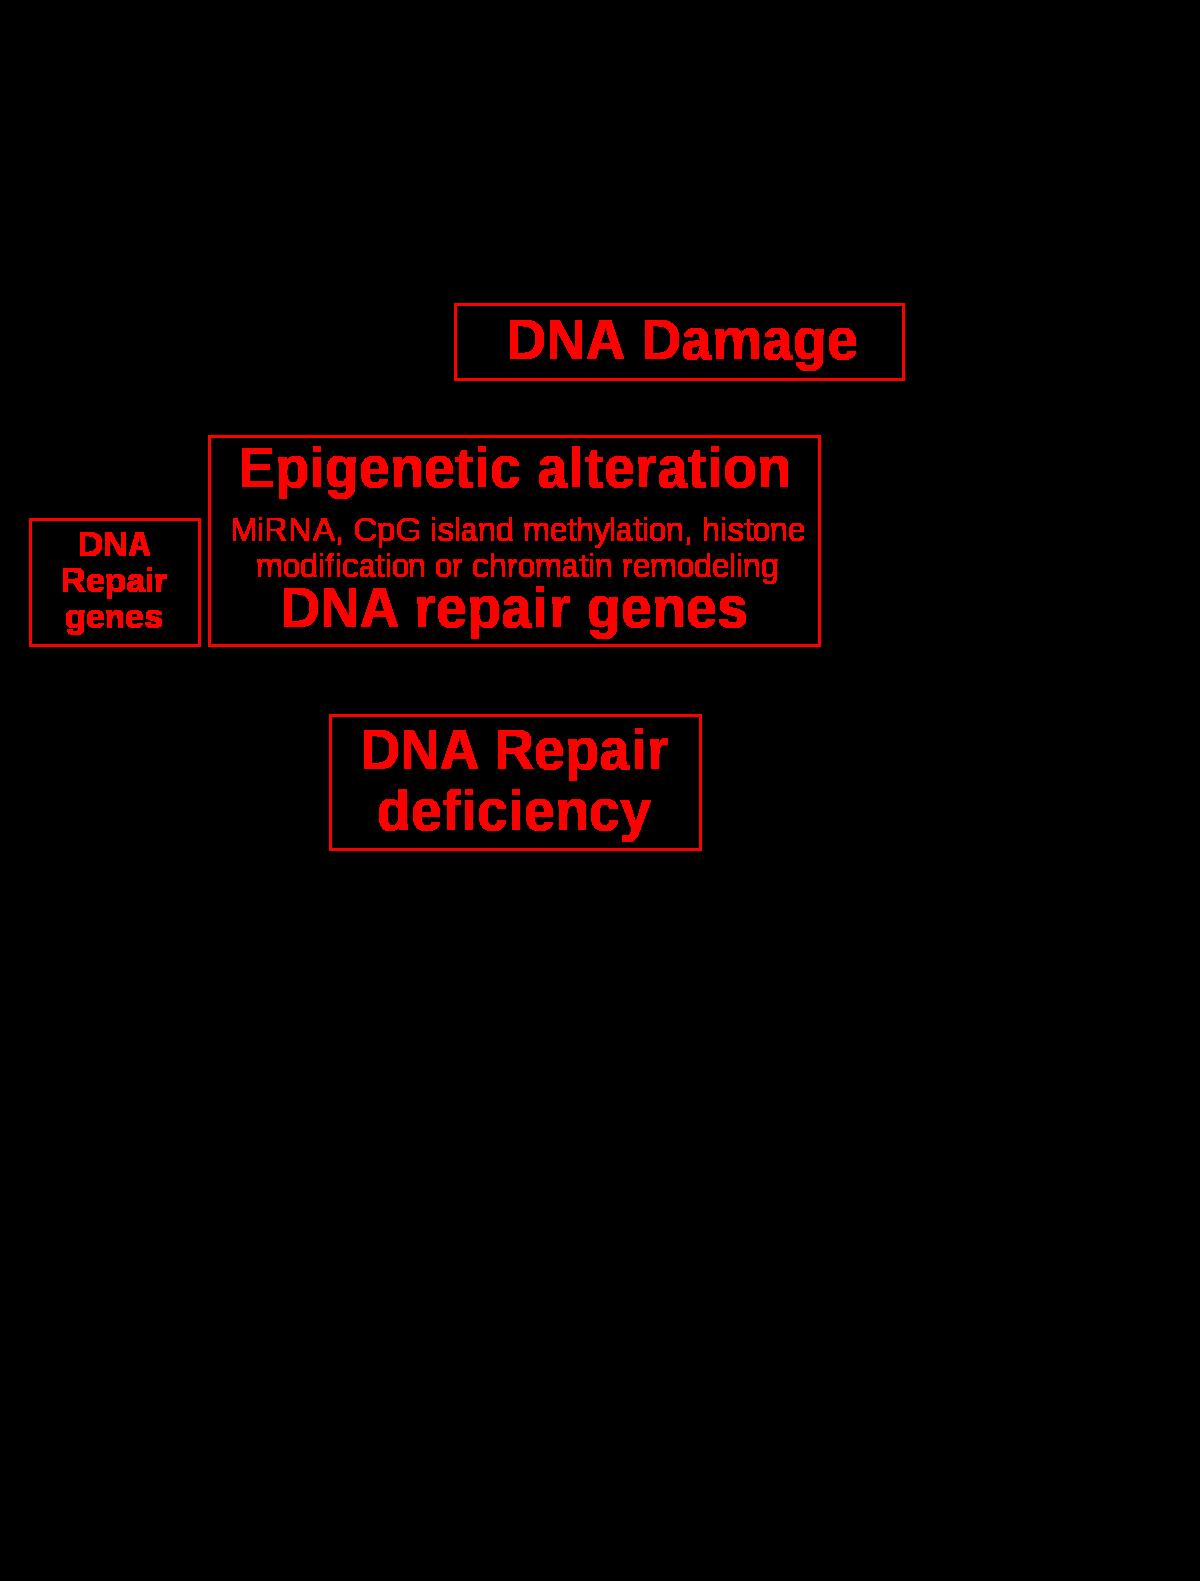 Tumormarkerek, Tumormarker vizsgálat - Medicover Laborvizsgálatok